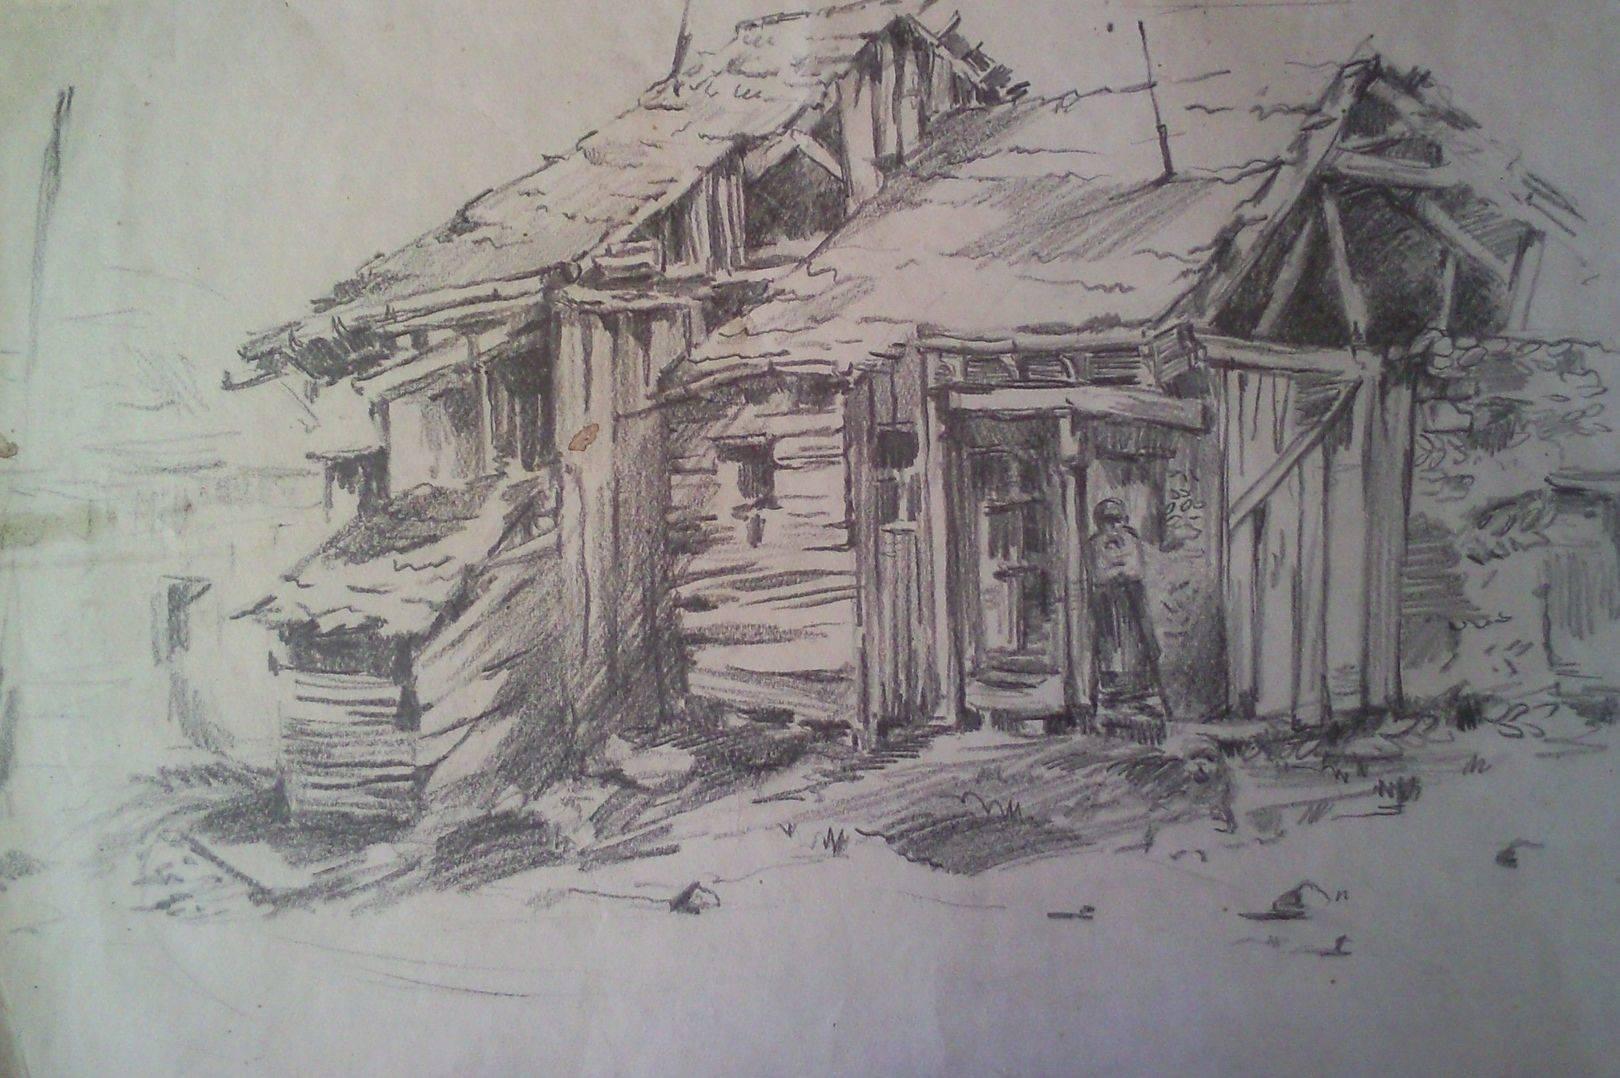 «Старые дома в Ахалкалаки»        бумага, карандаш «Old houses in the Akhalkalaki»       paper, pencil 43x65, 1983